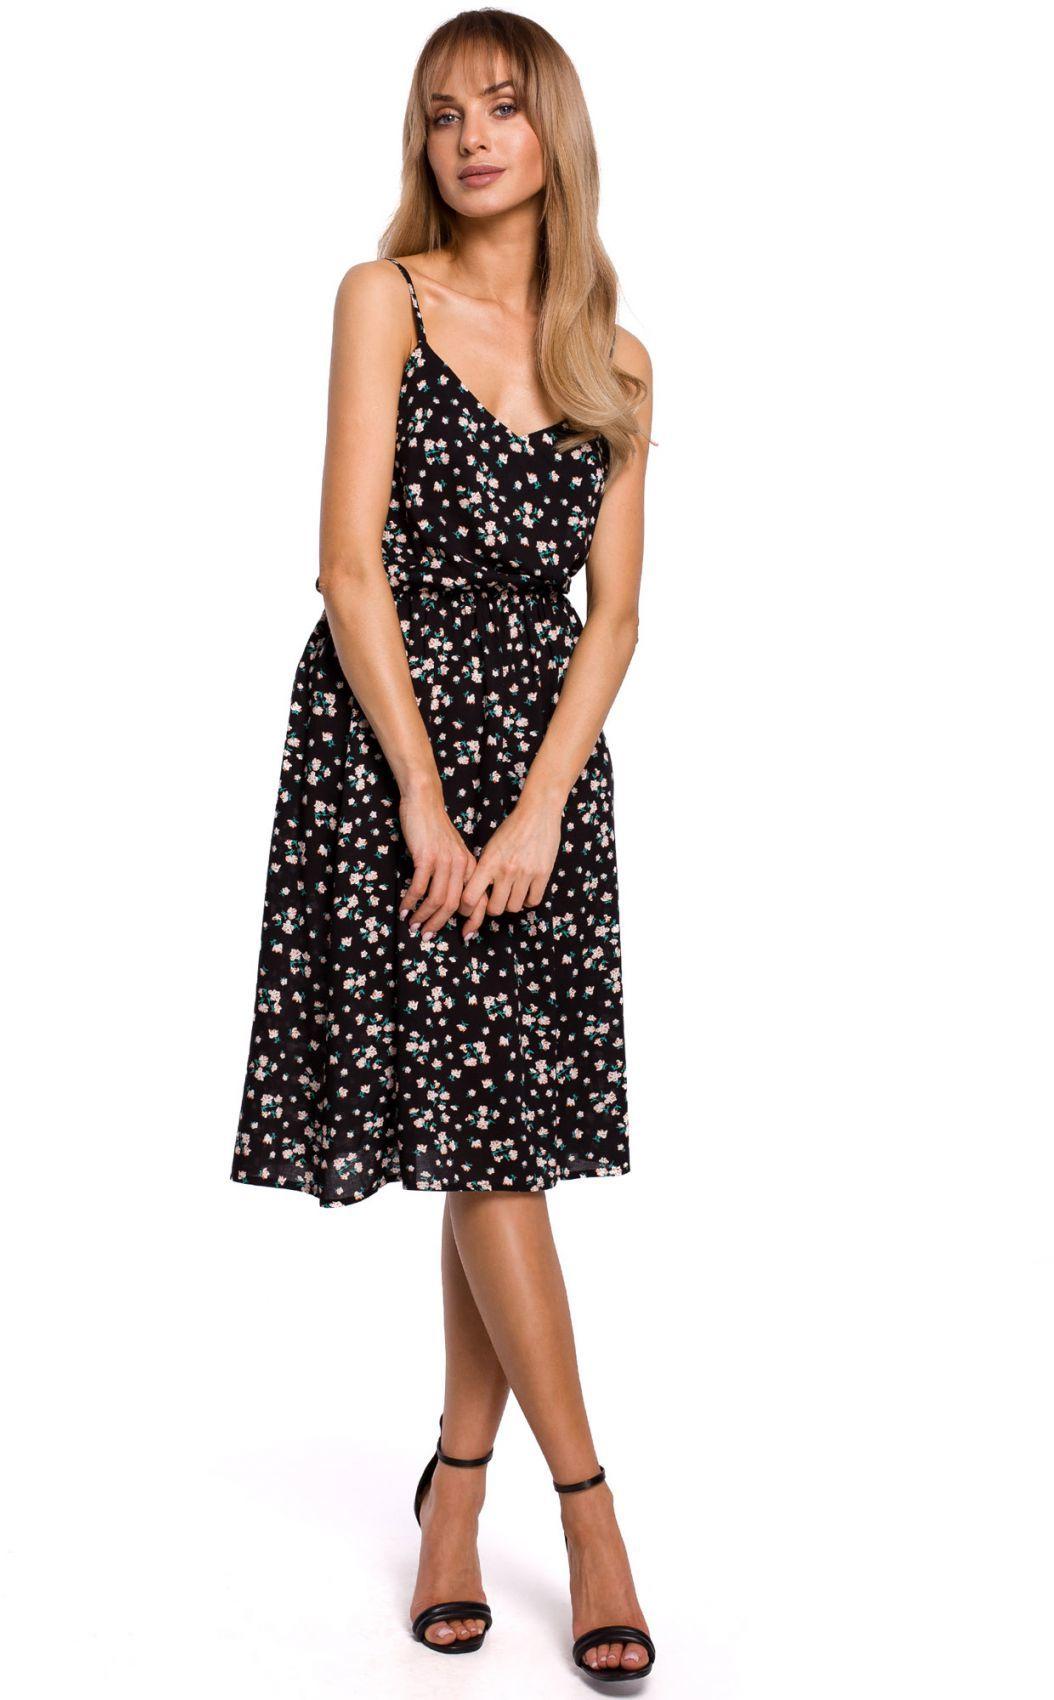 M518 Sukienka na cienkich ramiączkach - model 8